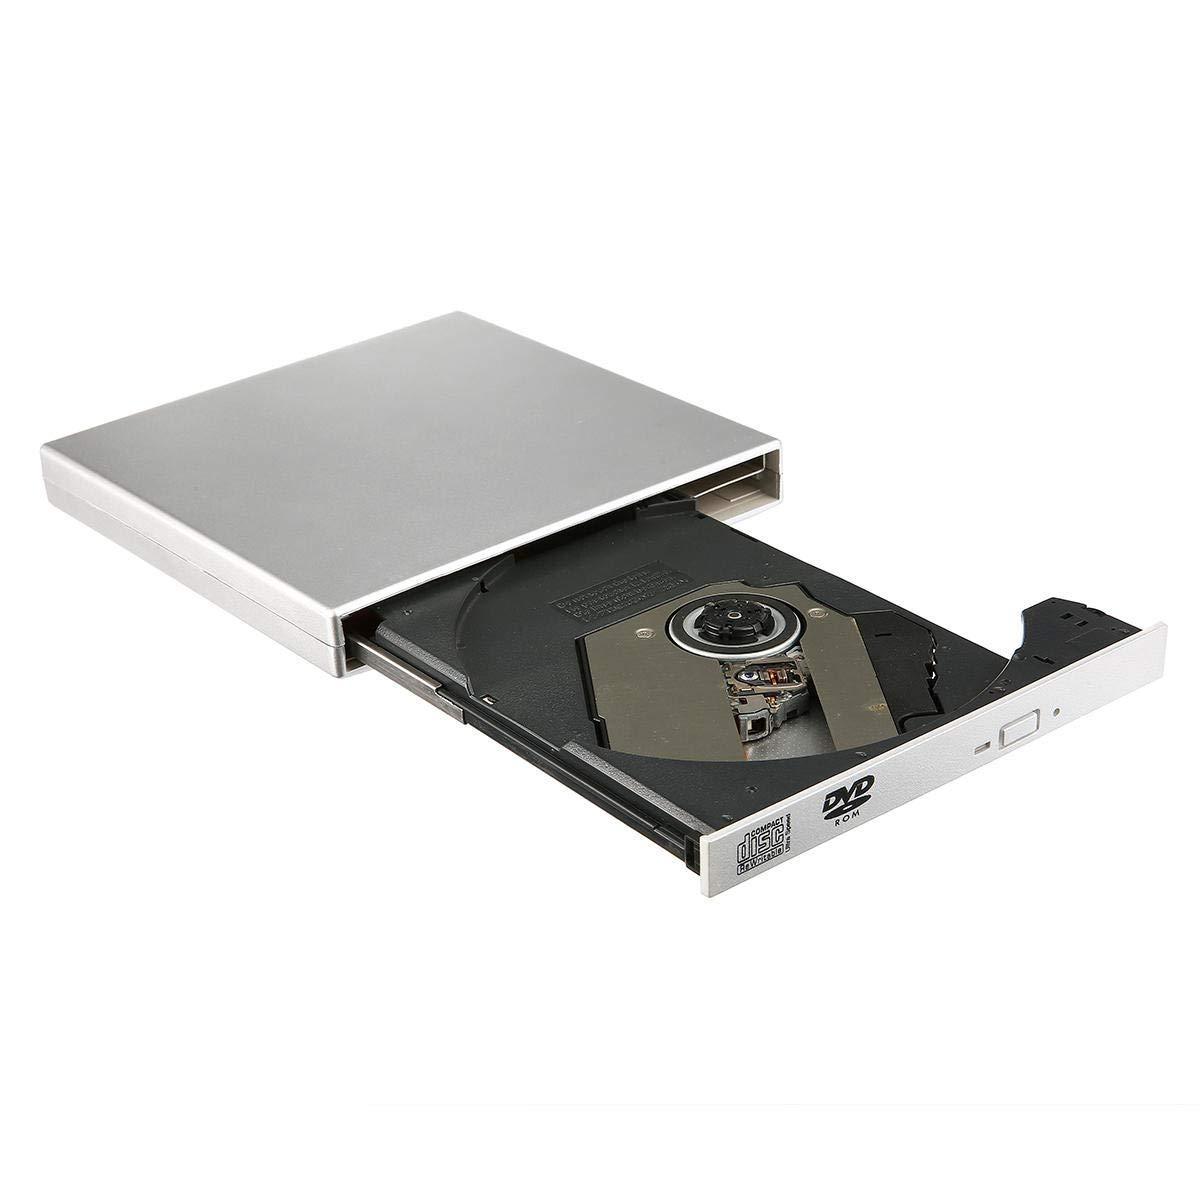 USB 2.0 External CD Burner CD/DVD Player Optical Drive for Laptop Windows - Computer Components Optical Drives - (Silver) - 1 USB2.0 External Drive